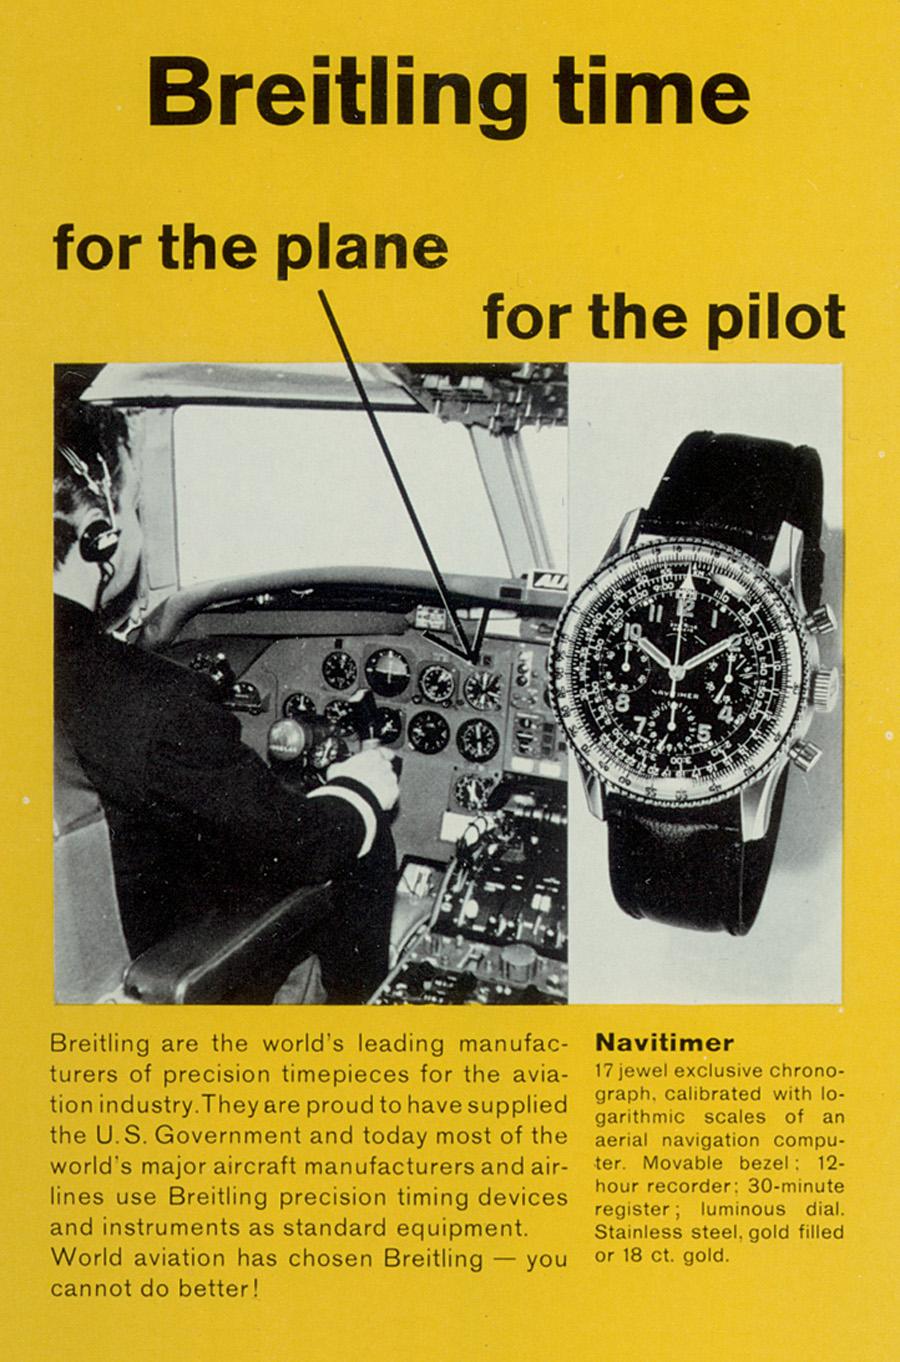 Breitling-for-plane-for-pilot